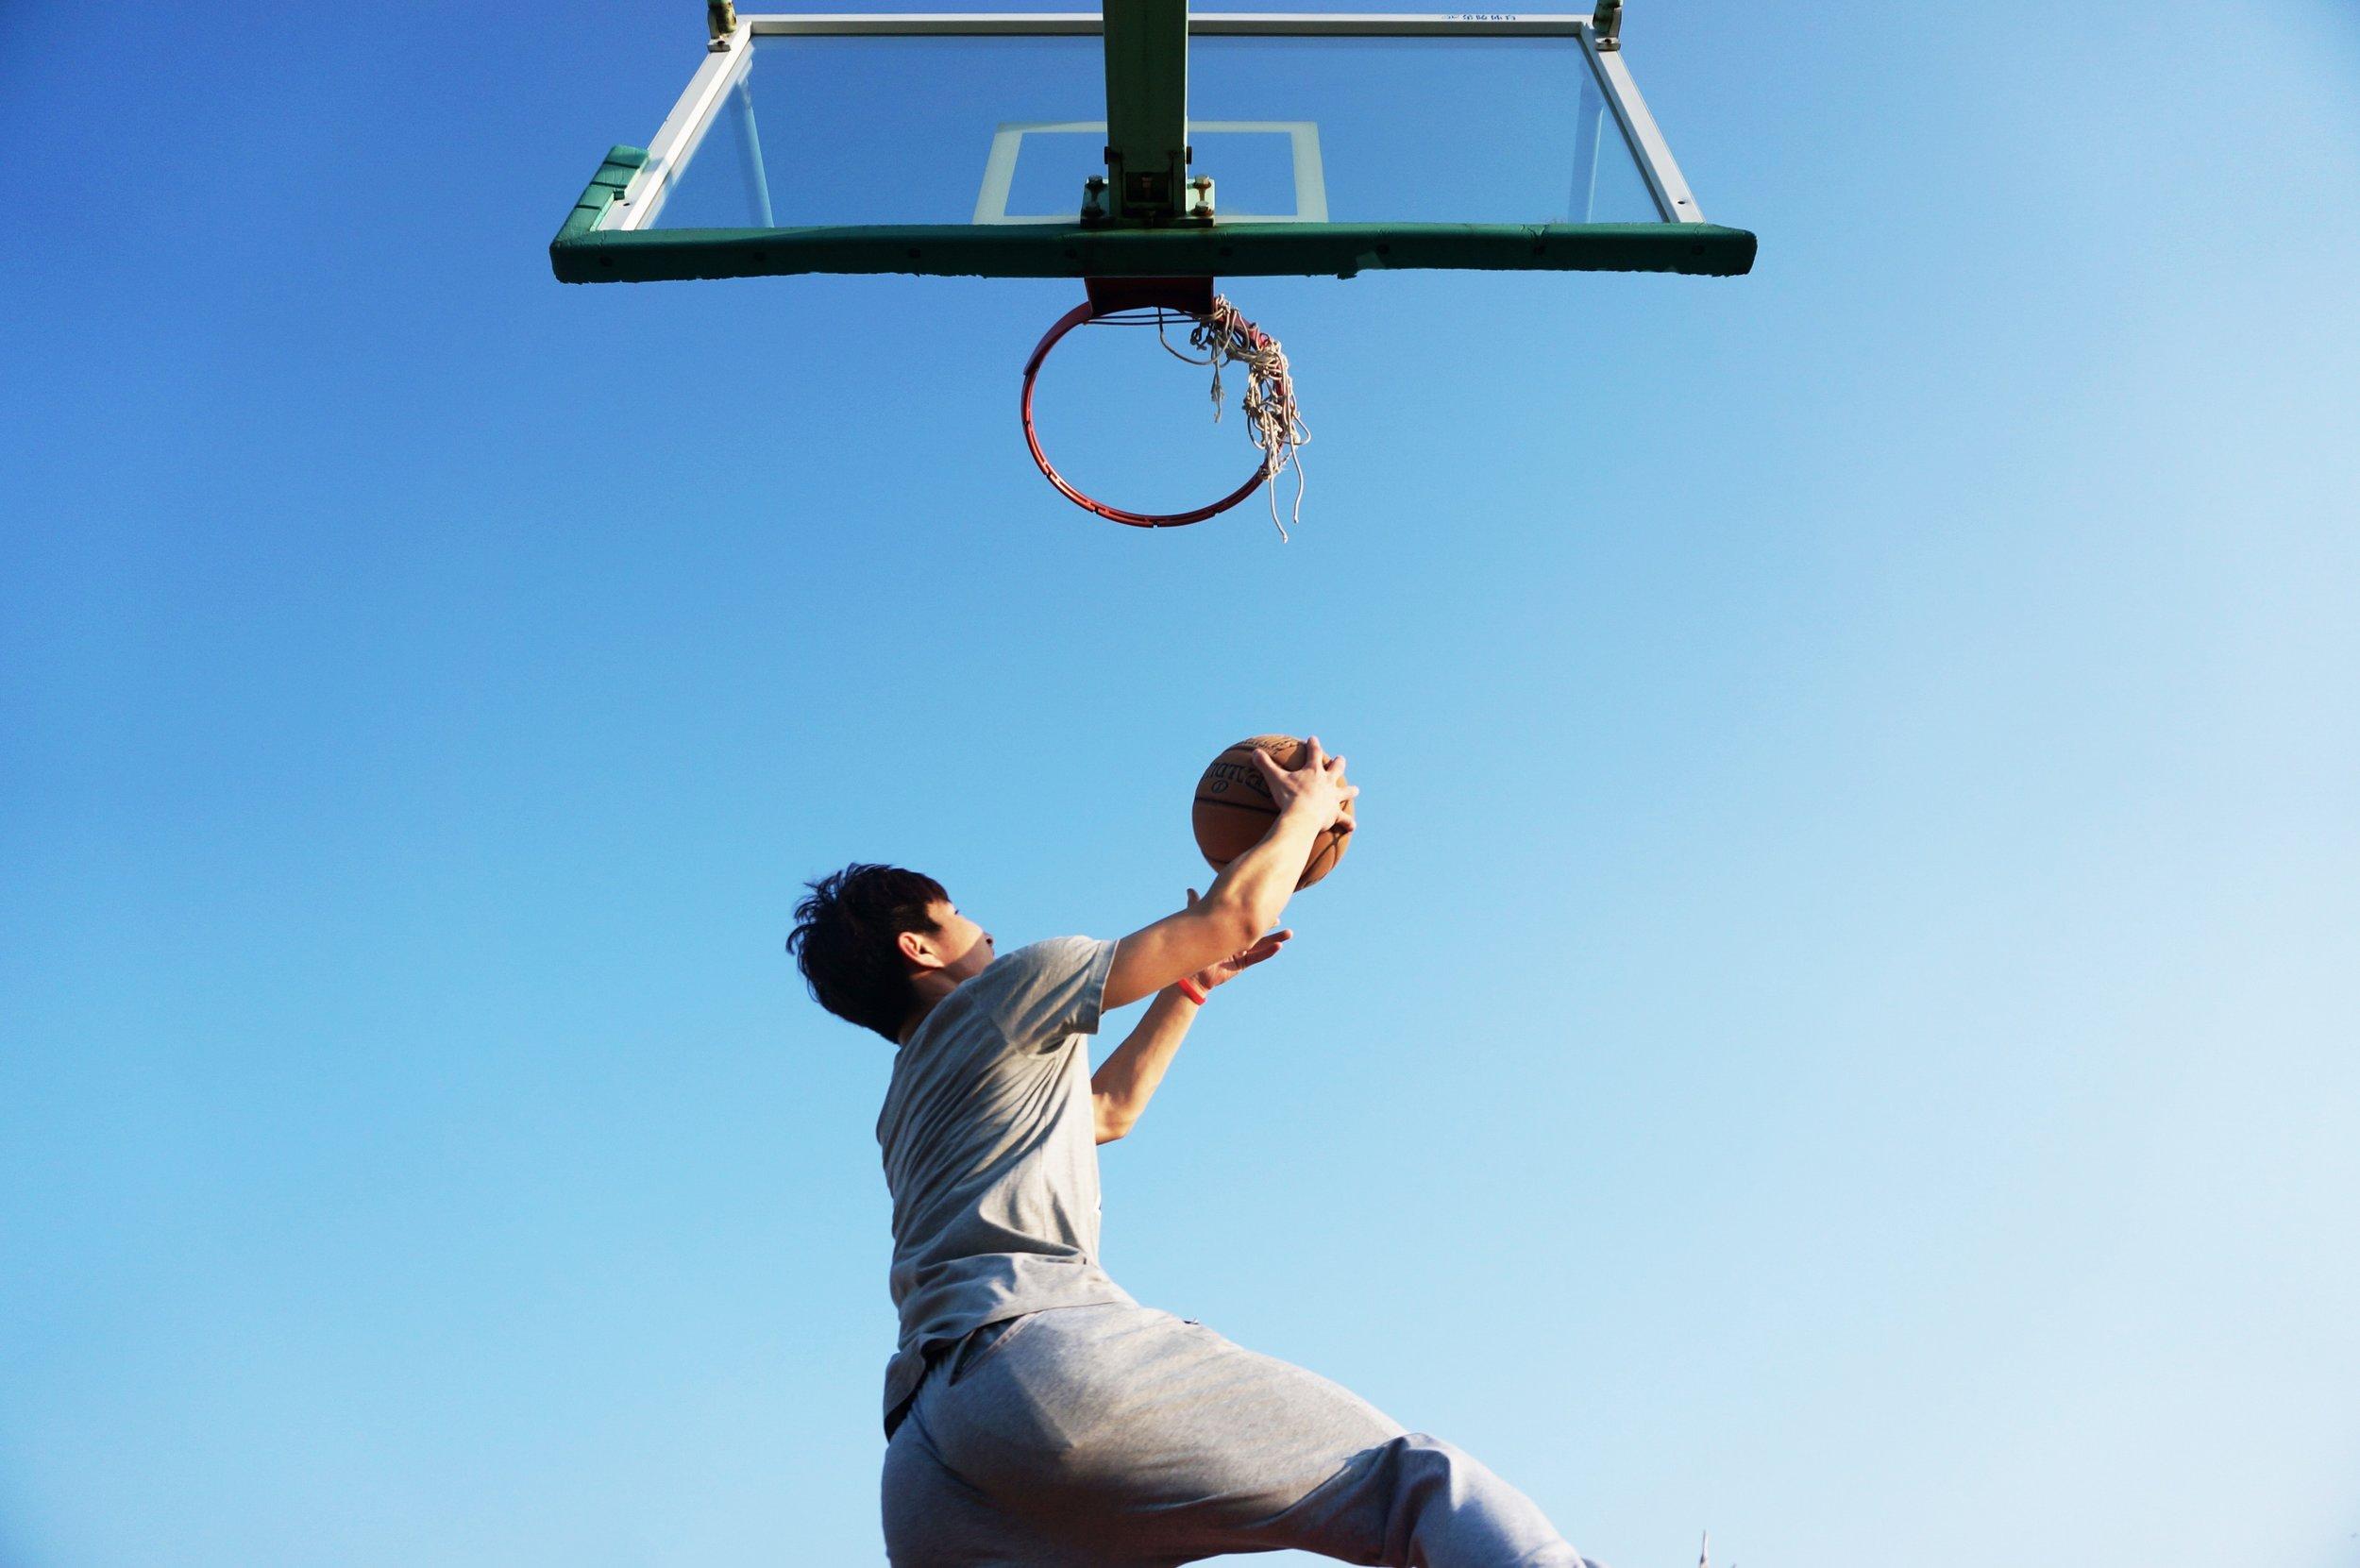 Get Fit Together - Sports & Rec